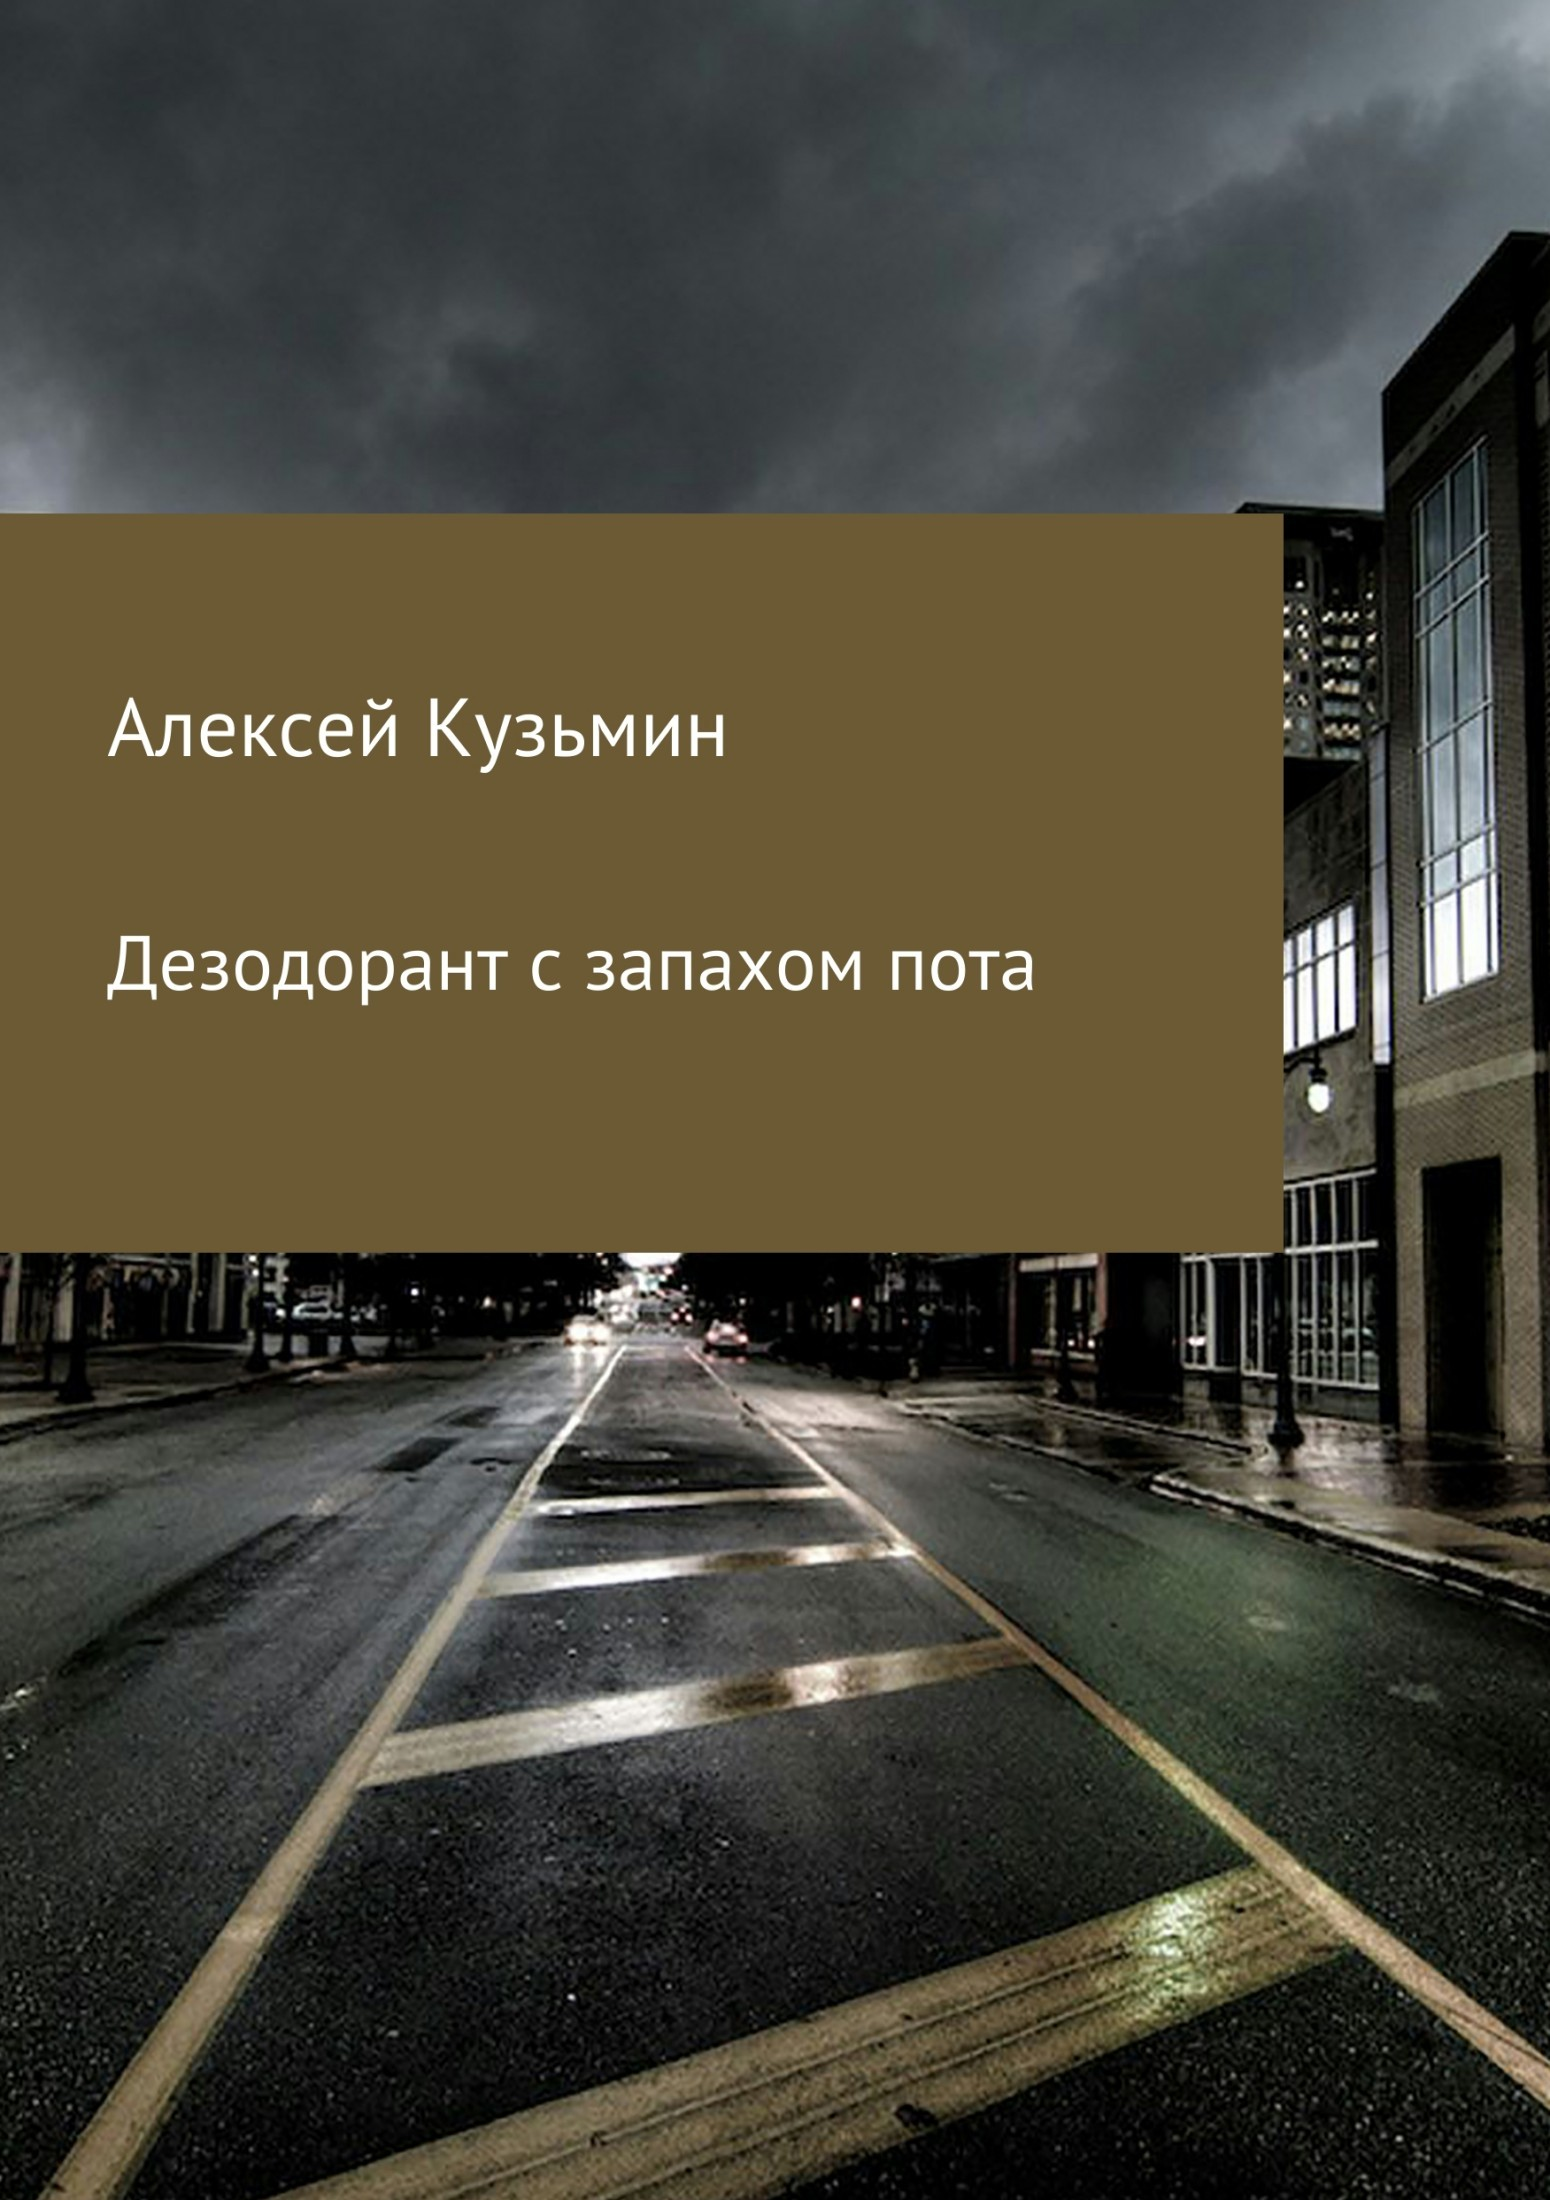 Алексей Борисович Кузьмин. Дезодорант с запахом пота